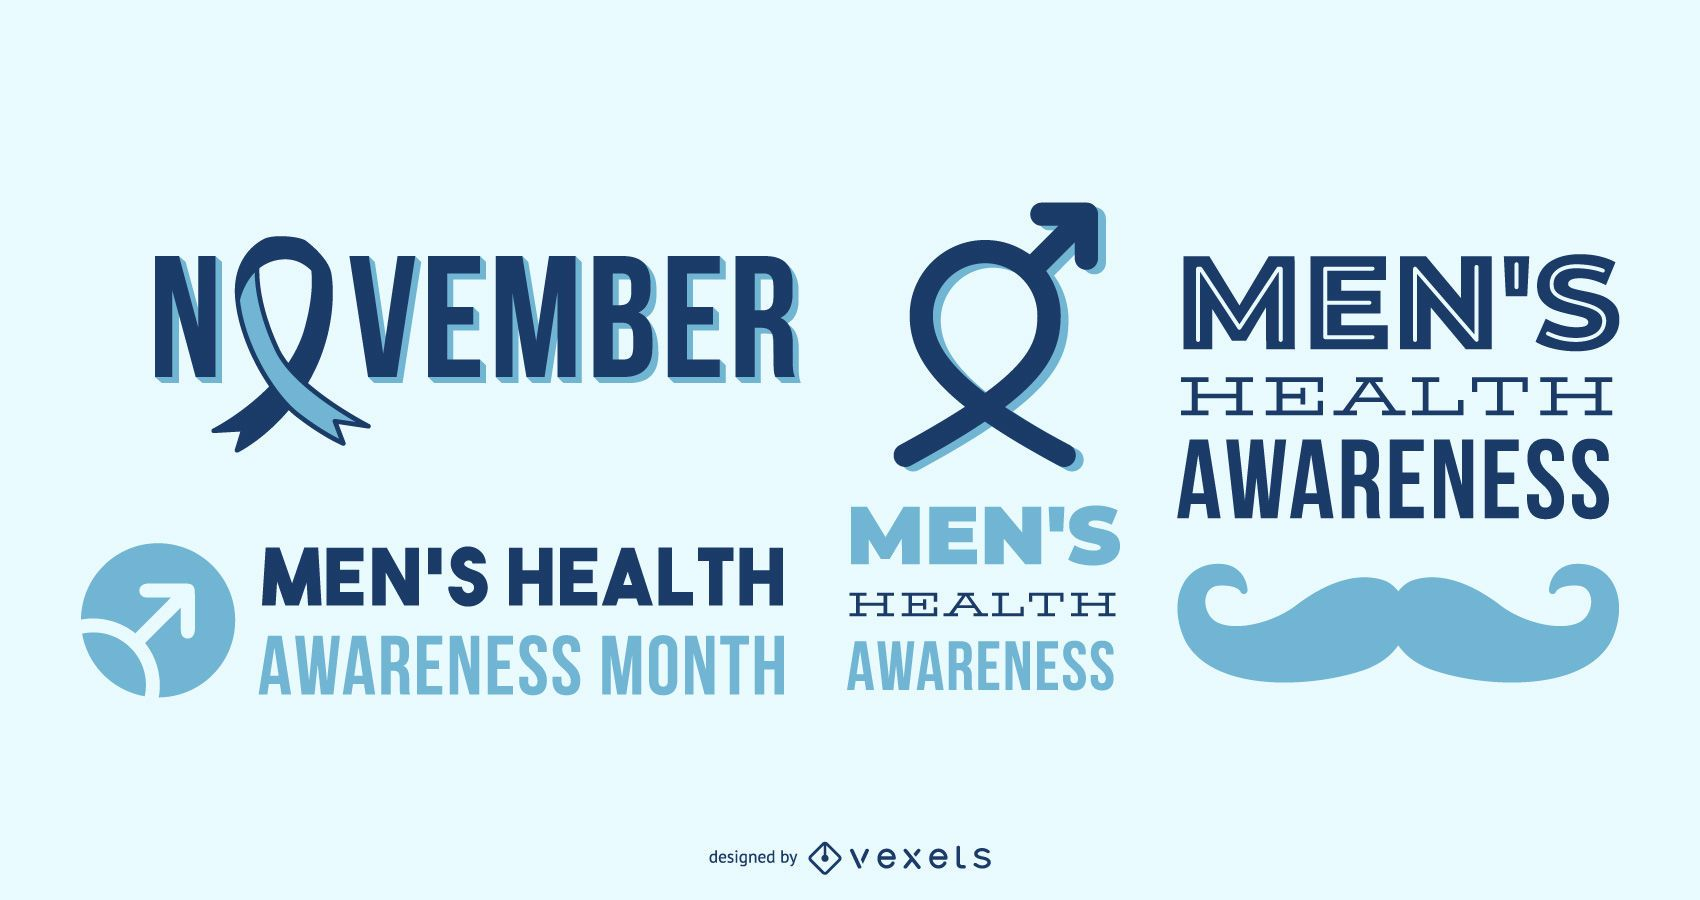 Men's health awareness letterings